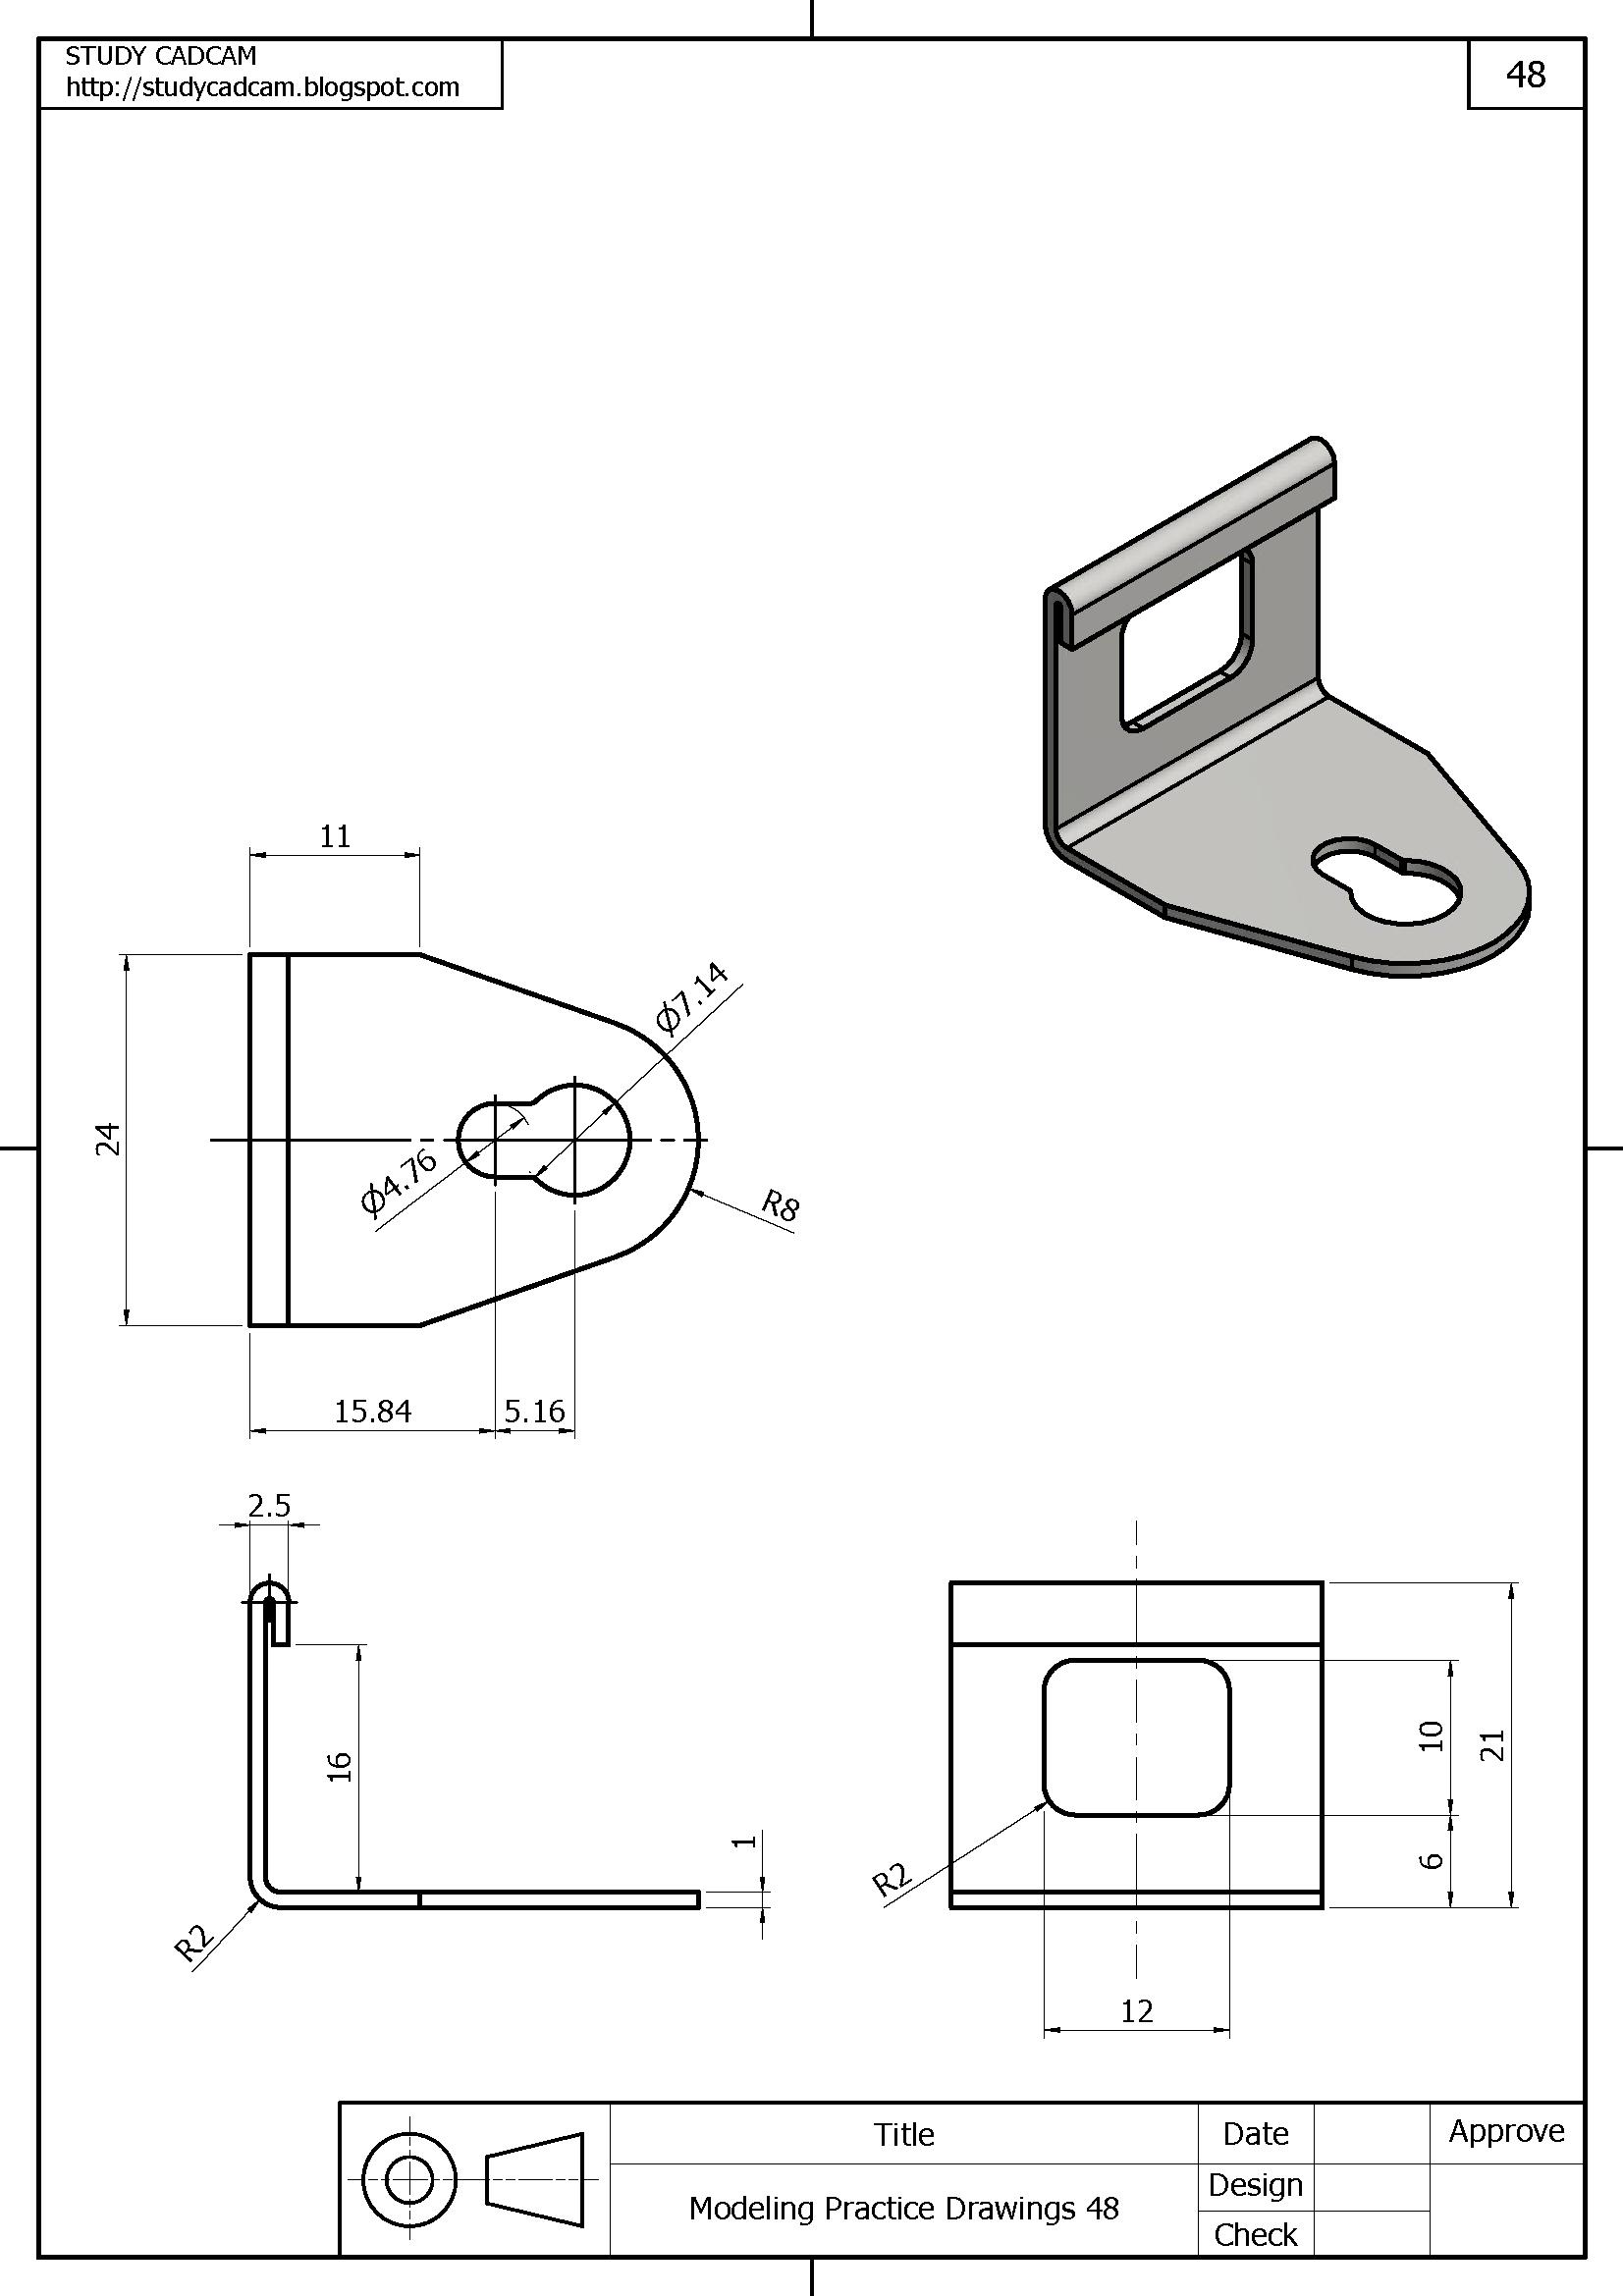 3d Modeling Practice Studycadcam